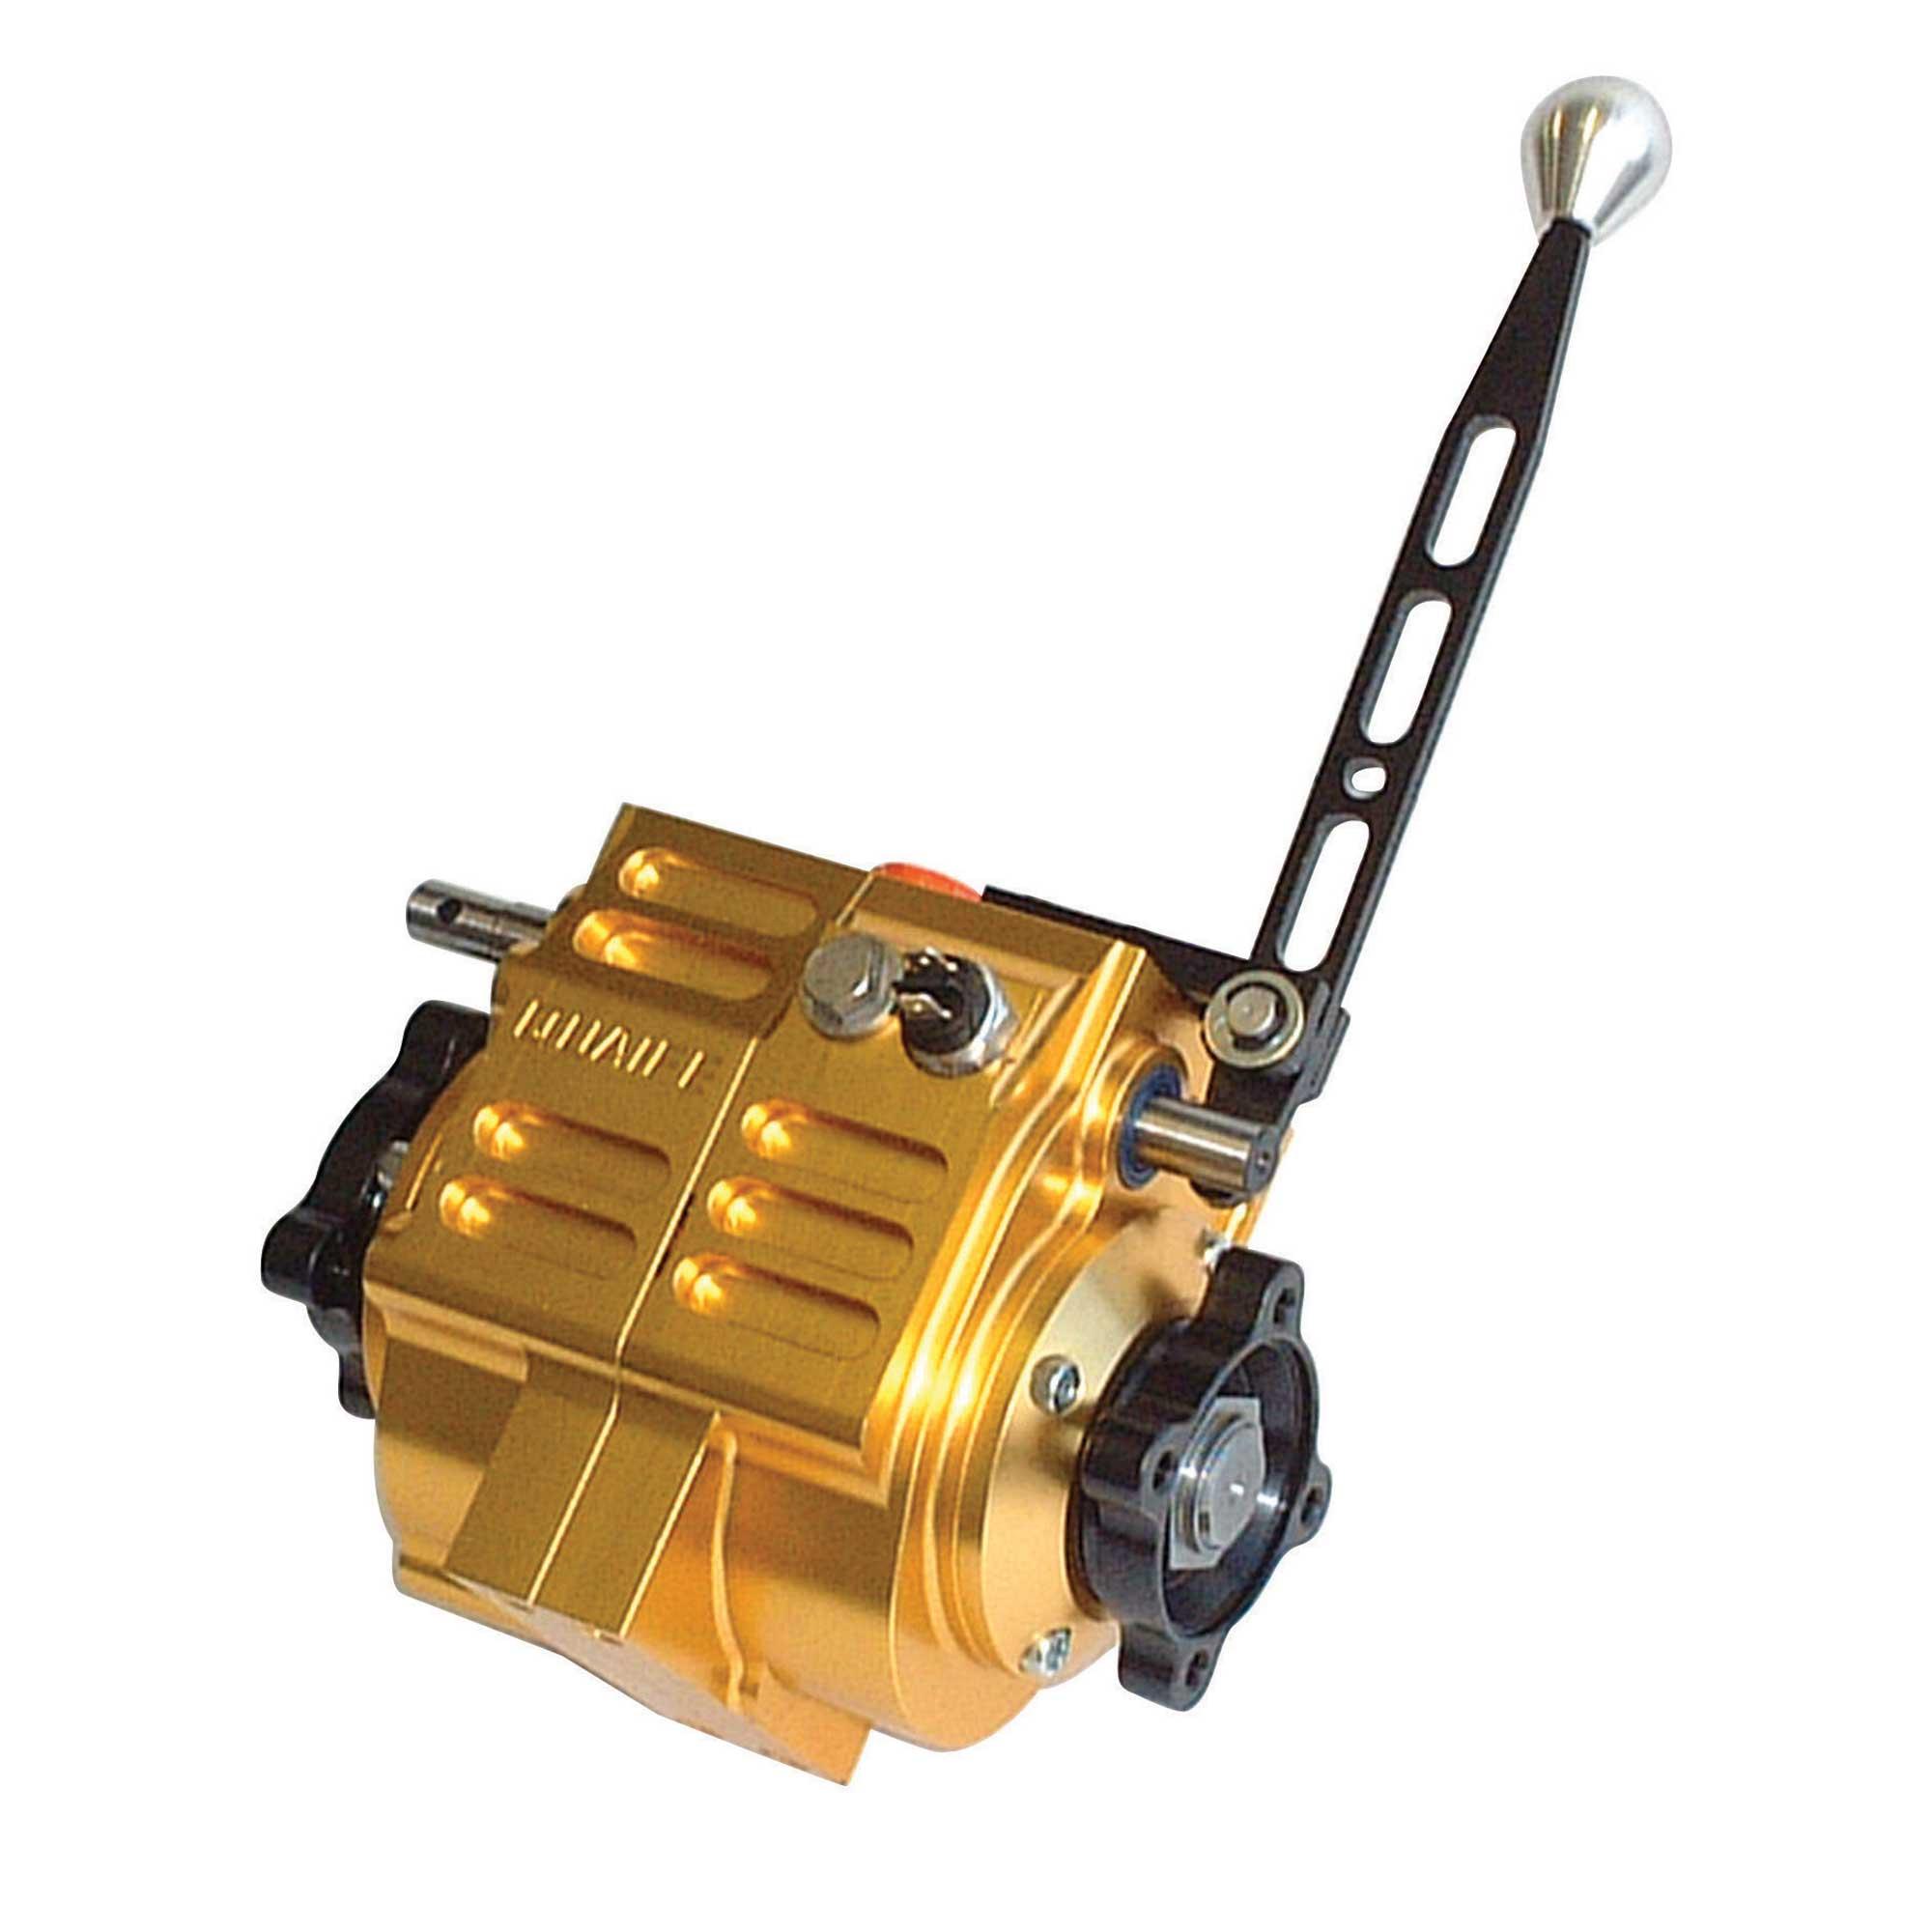 quaife reversing gear box for motorcycle bike inline engine car - qbe35g001